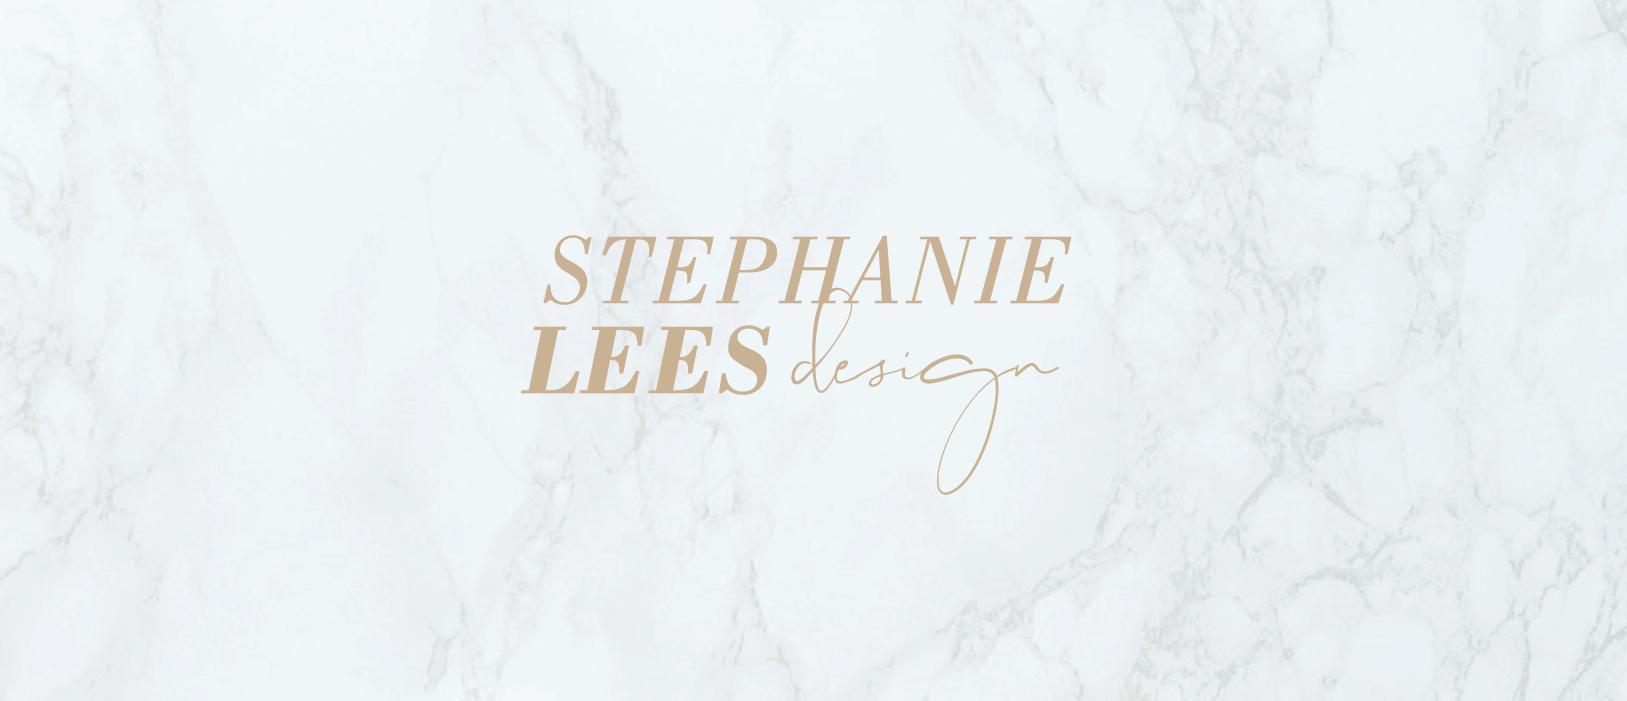 stephanie lees design interior design brand logo